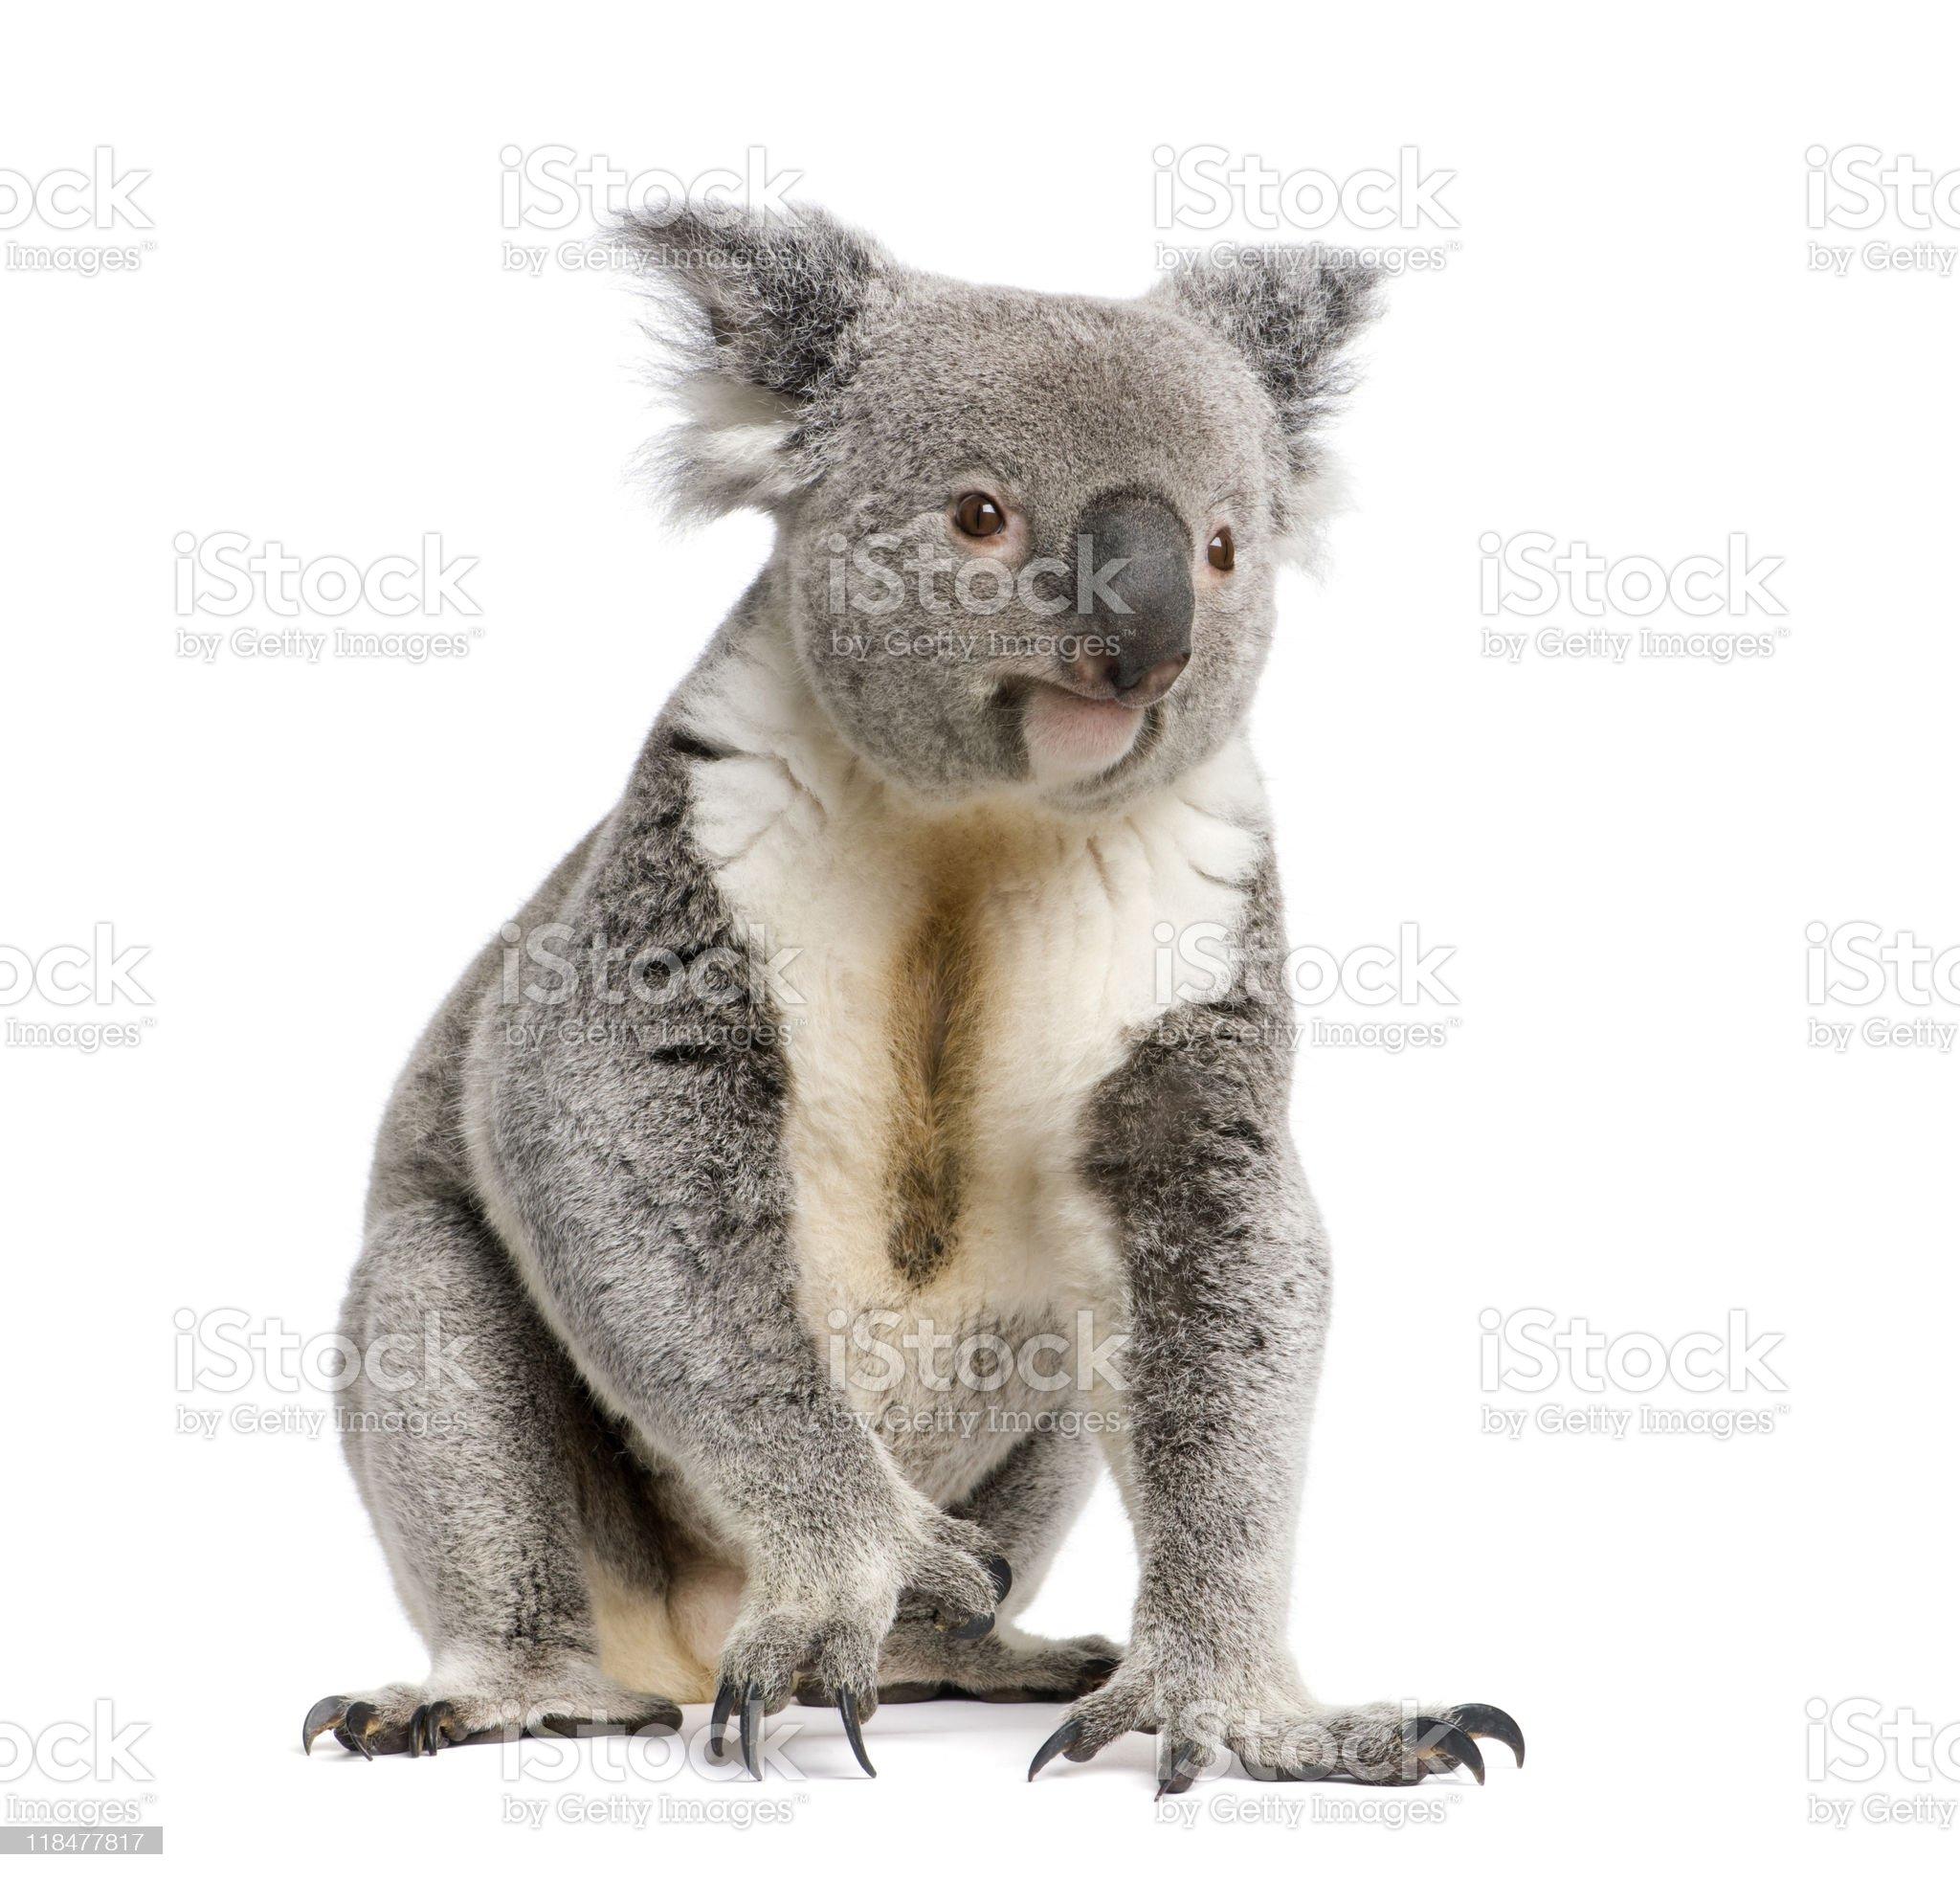 Portrait of male Koala bear against white background royalty-free stock photo